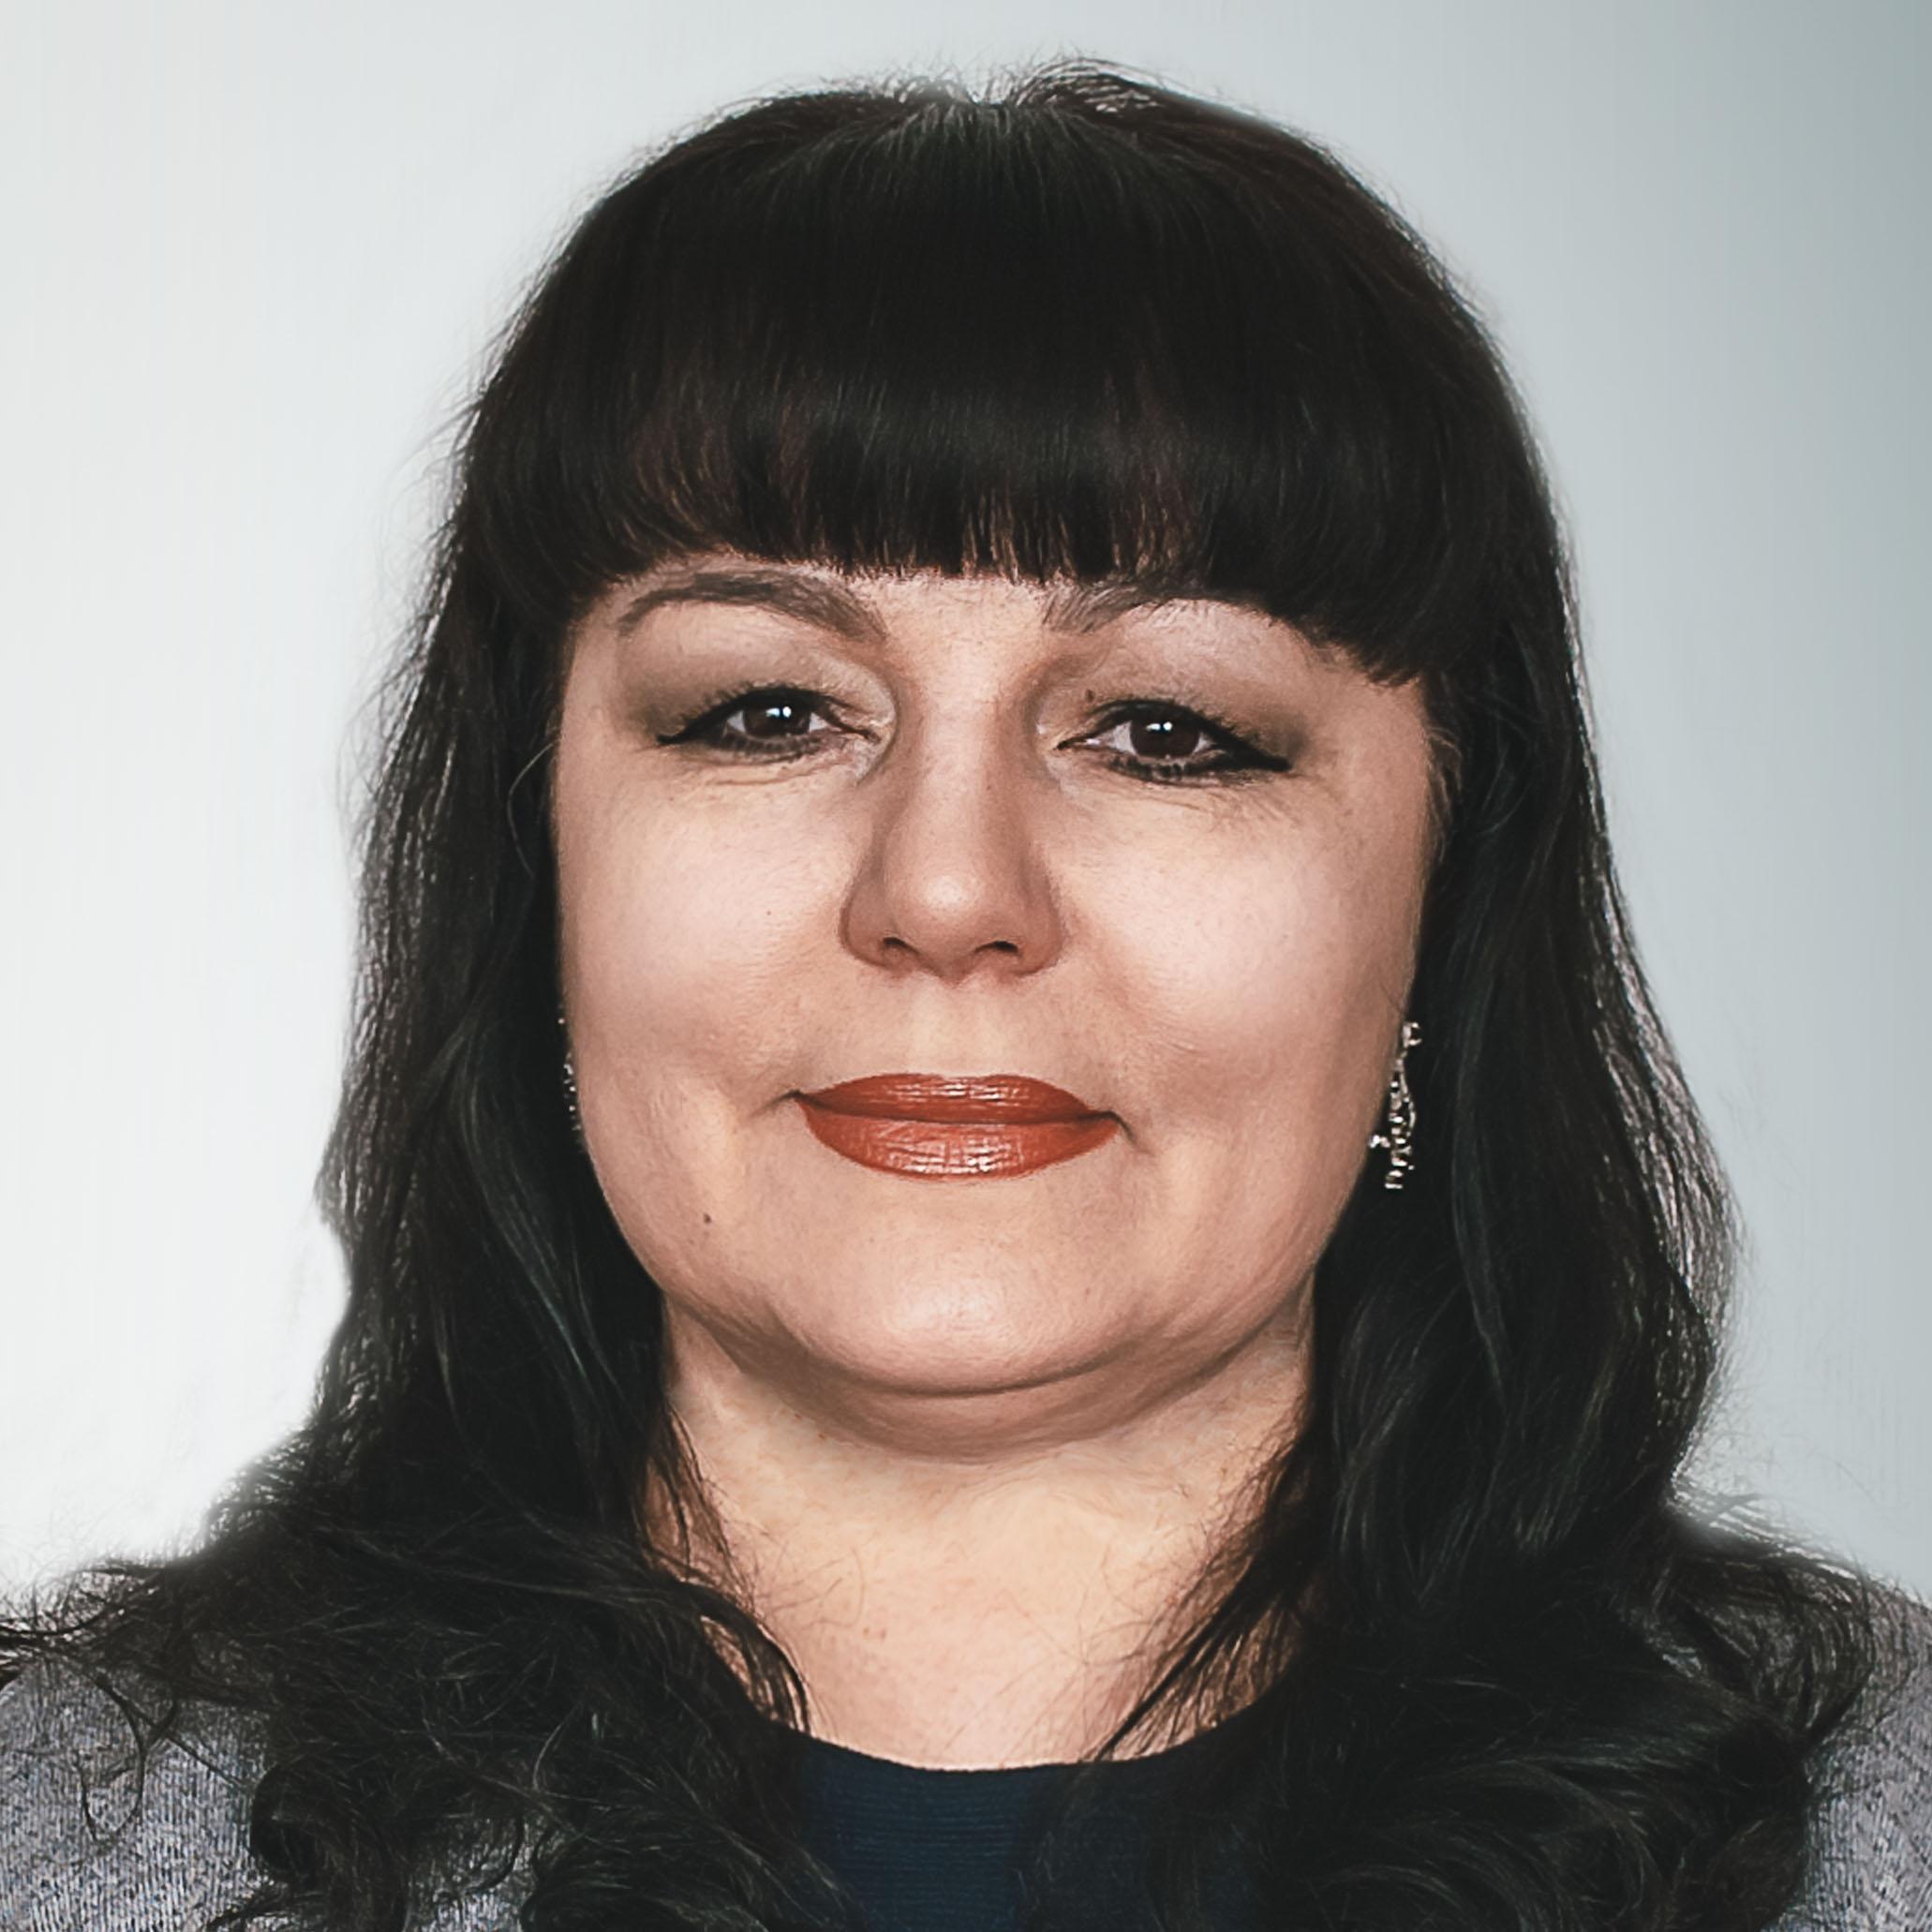 Светлана Филипповна Бахтеева